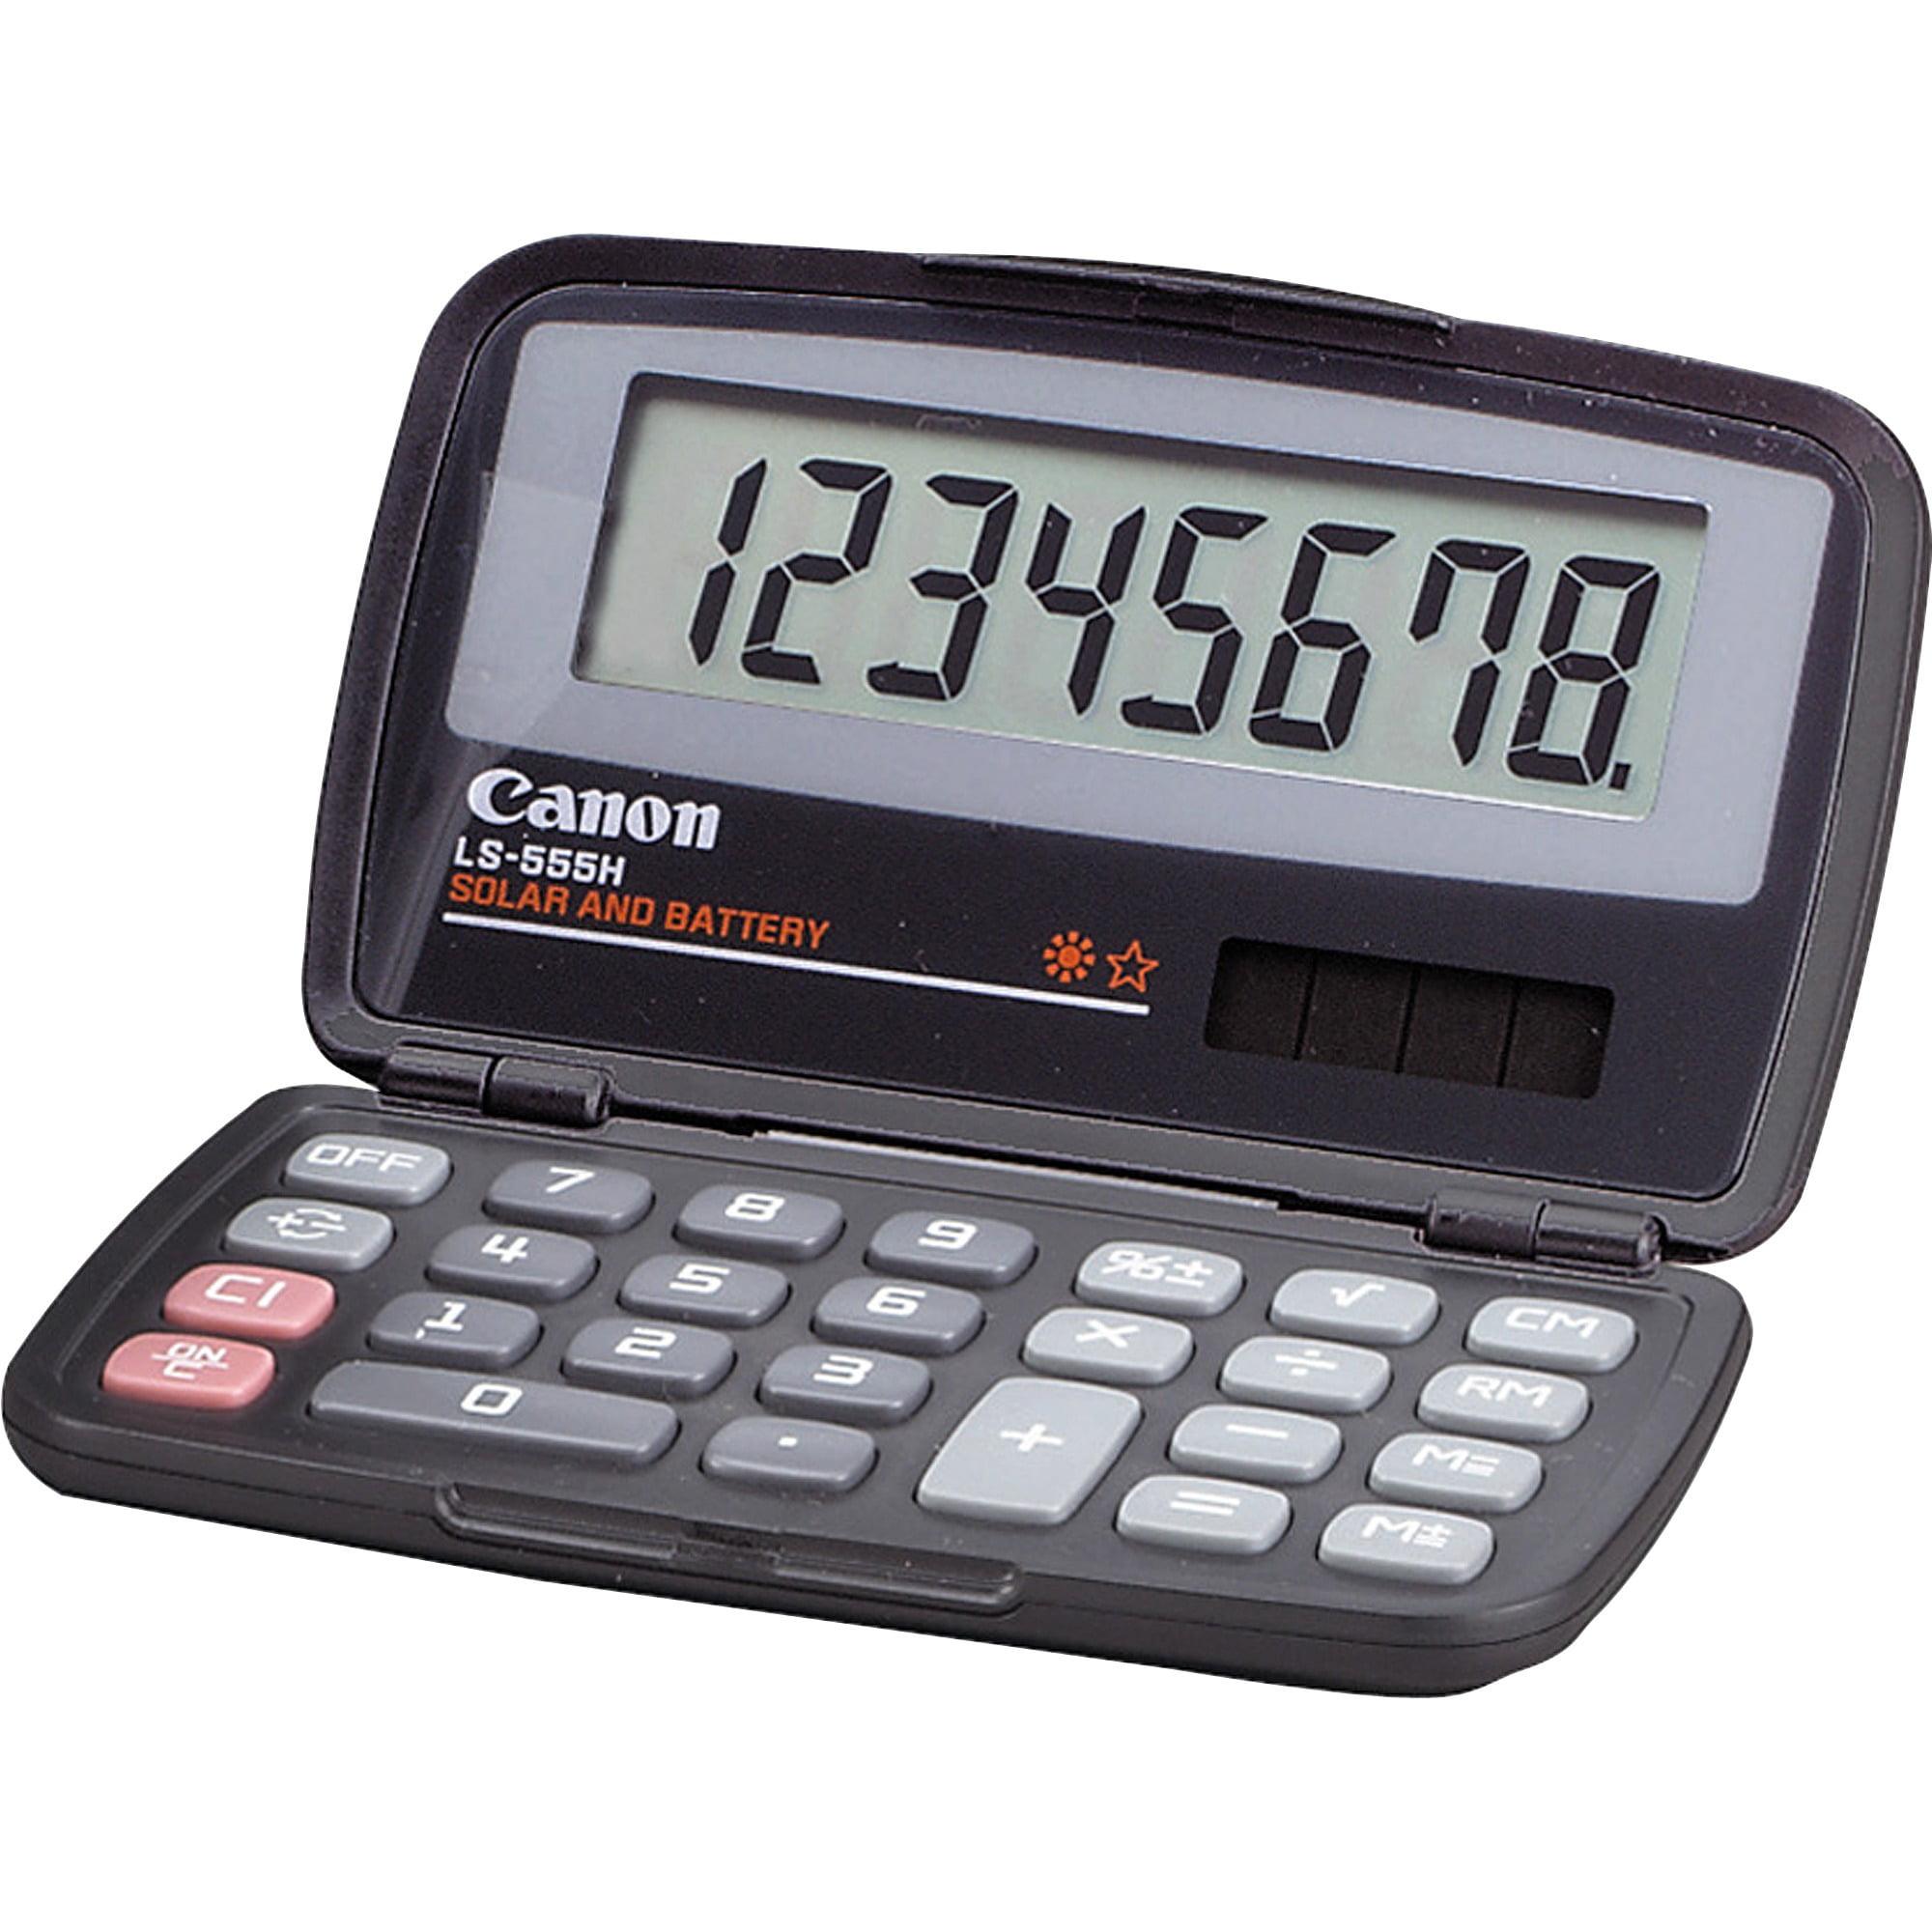 Canon, CNMLS555H, LS555H Wallet Calculator, 1 Each, Black